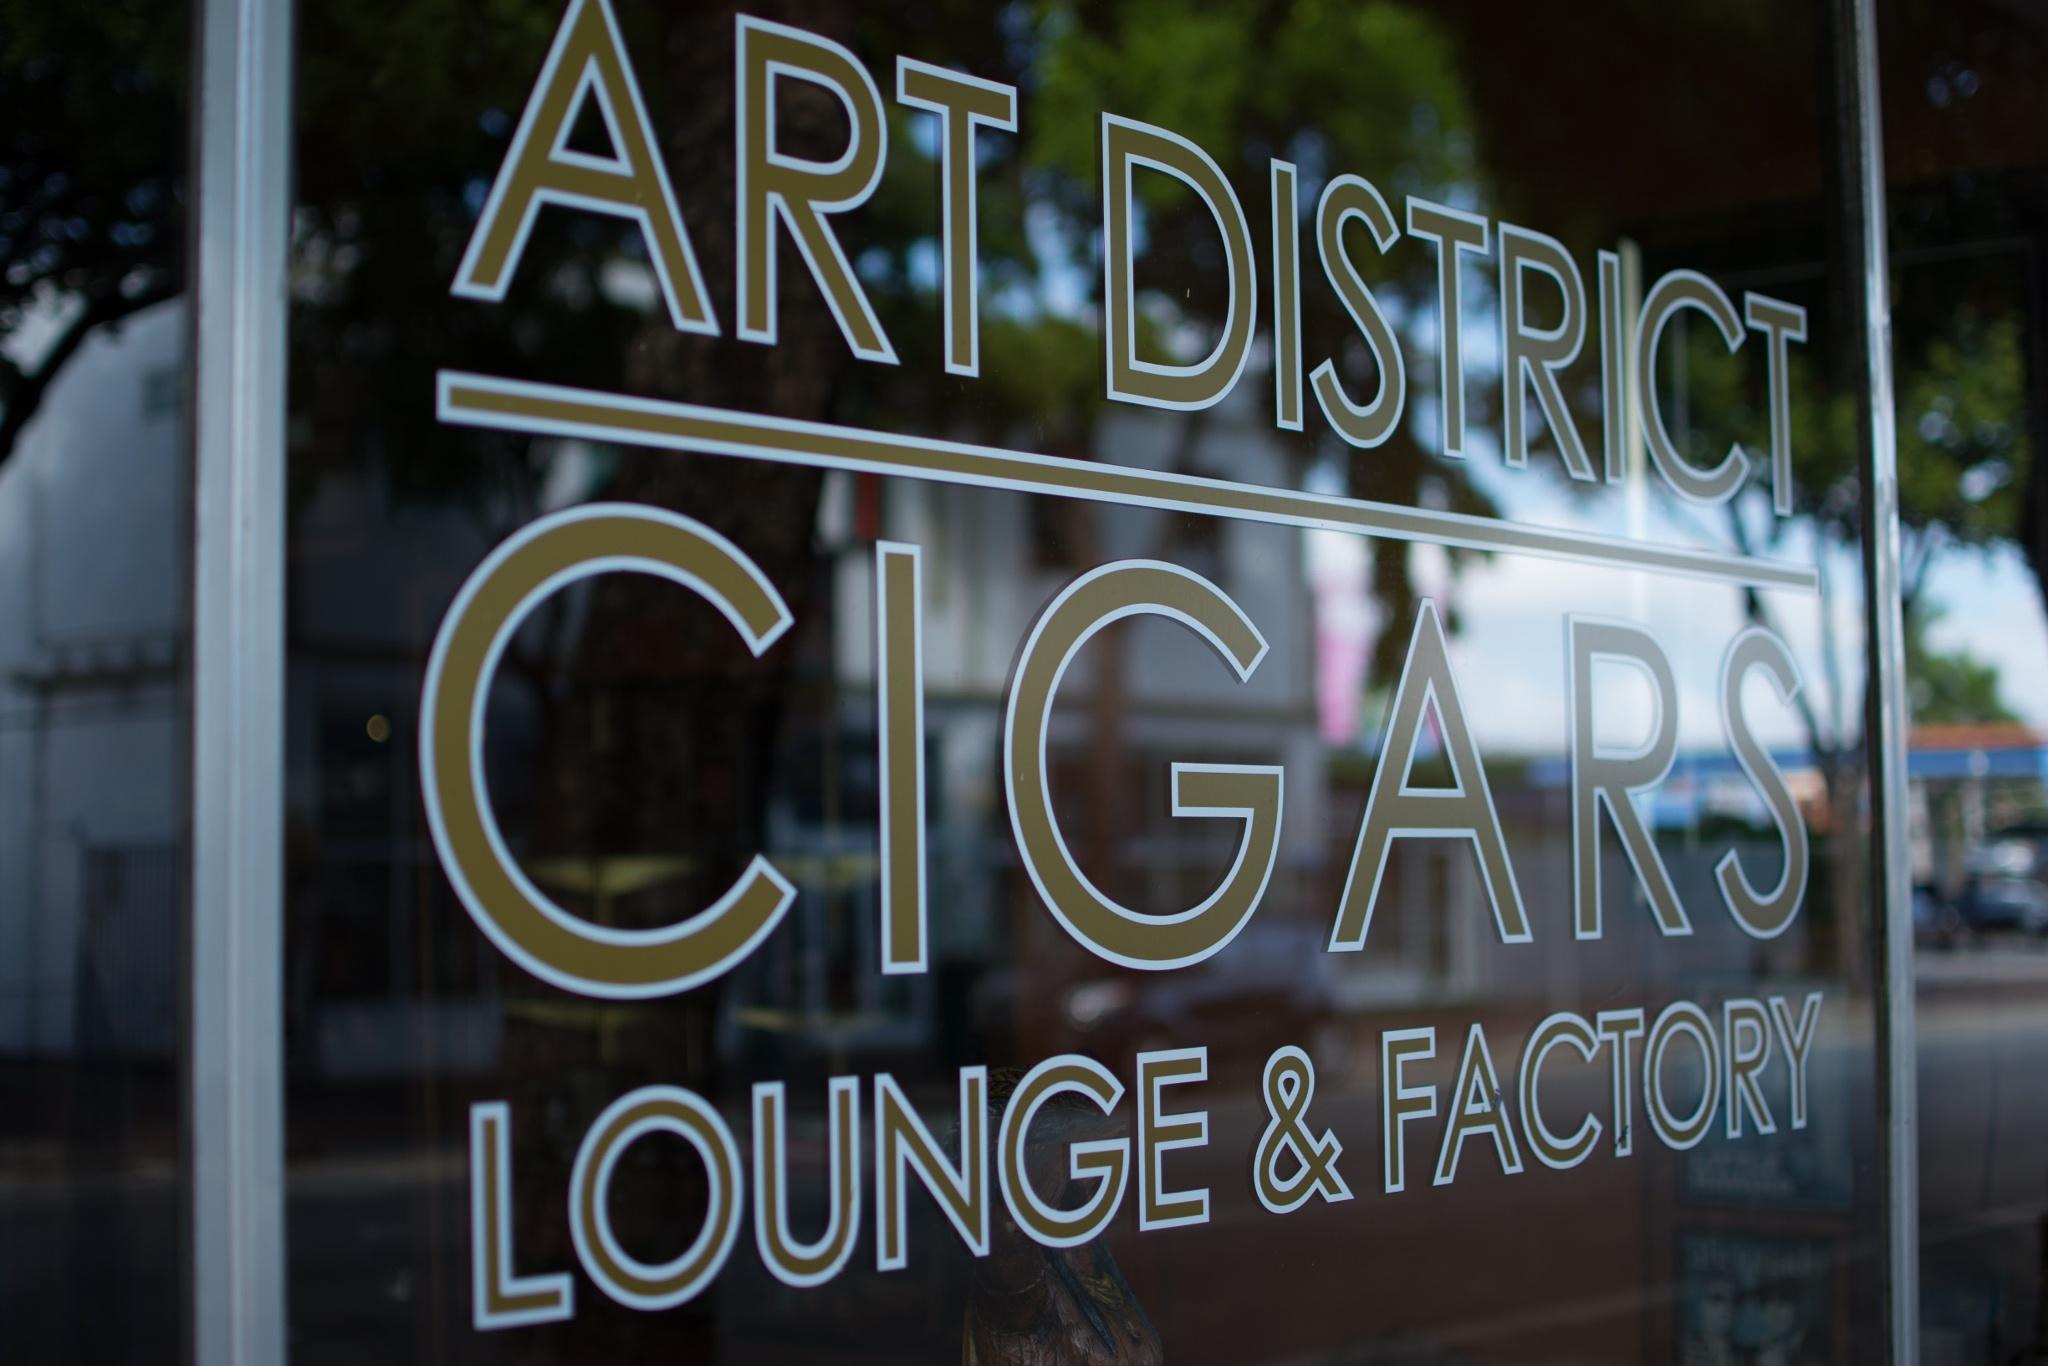 Cigar Store by John Schneyer